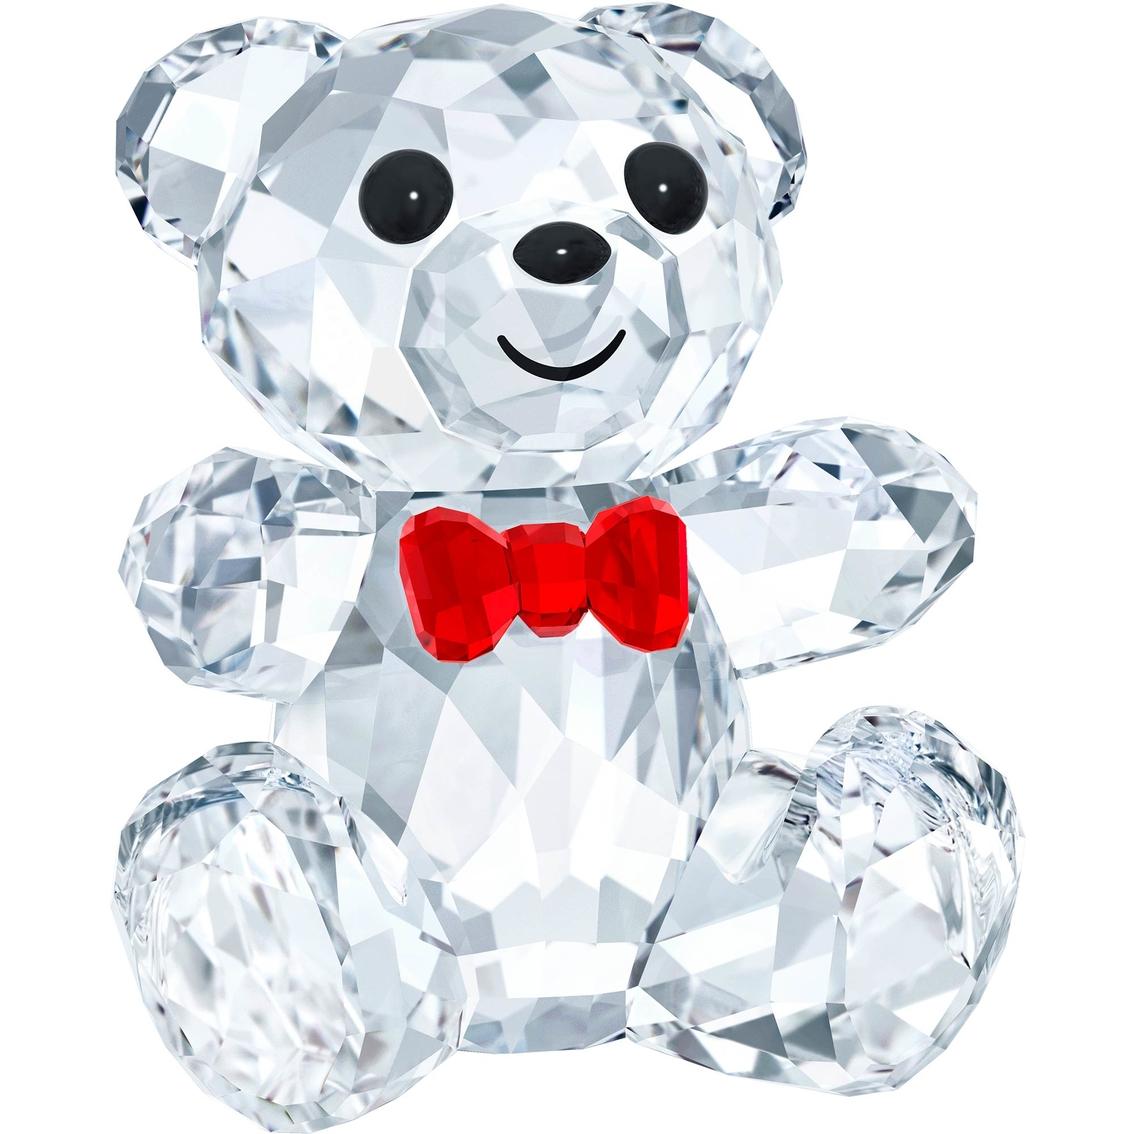 8655acfc08 Swarovski Kris Bear, I Am Big Now | Collectible Figurines | Gifts ...